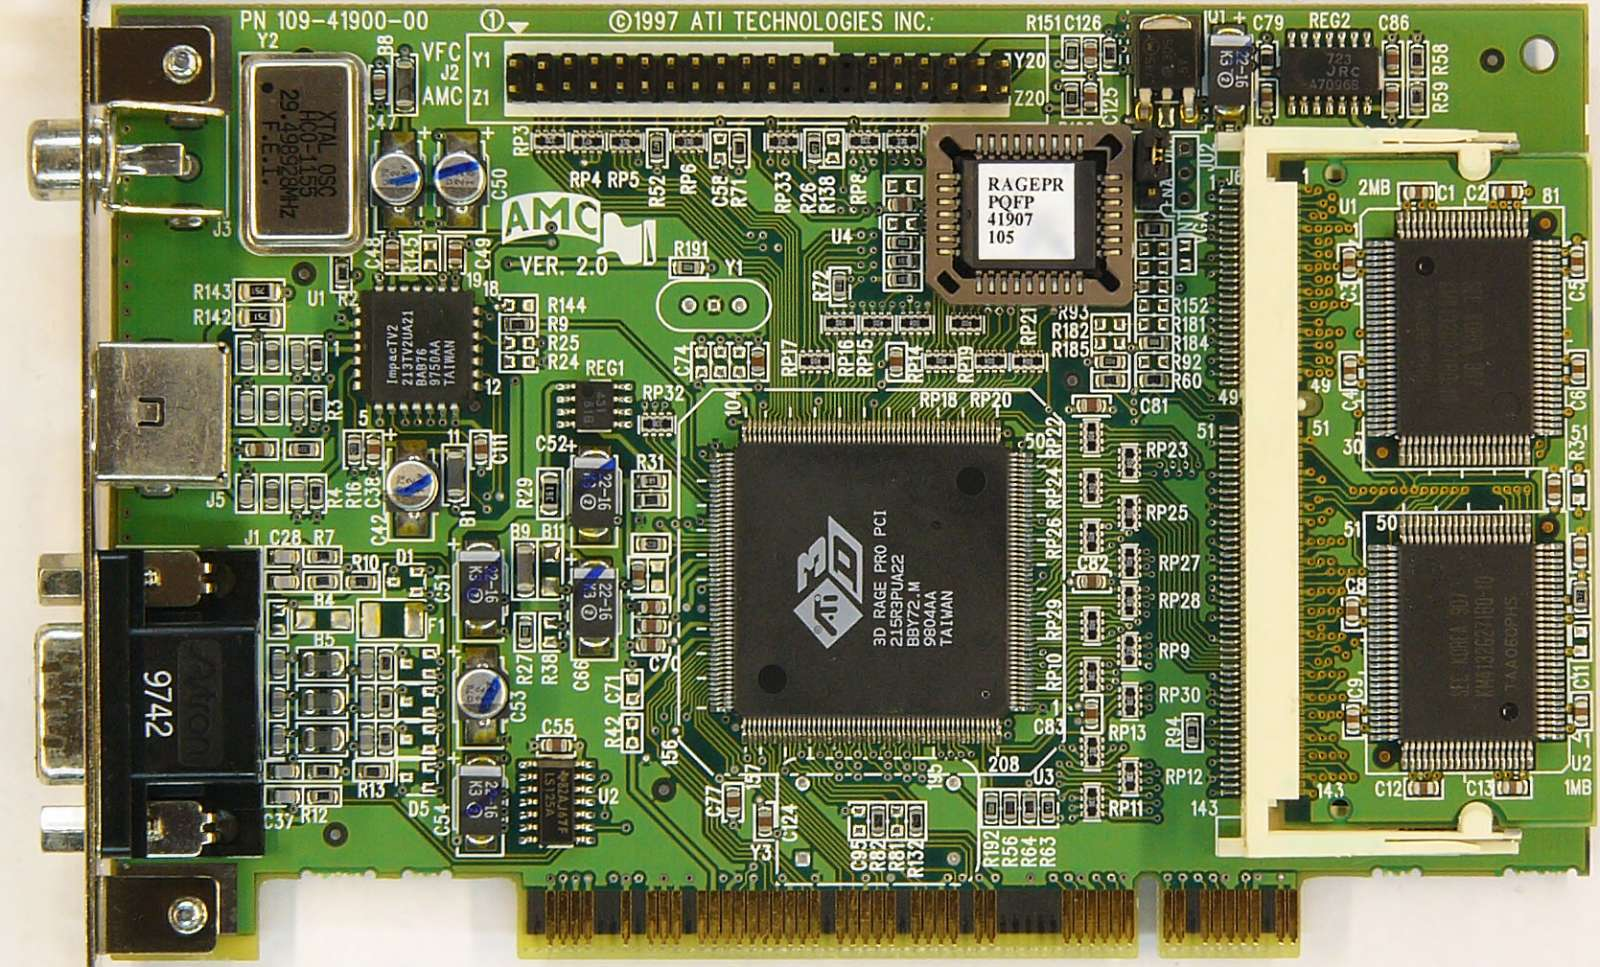 Ati technologies inc rage xl pci driver free download.